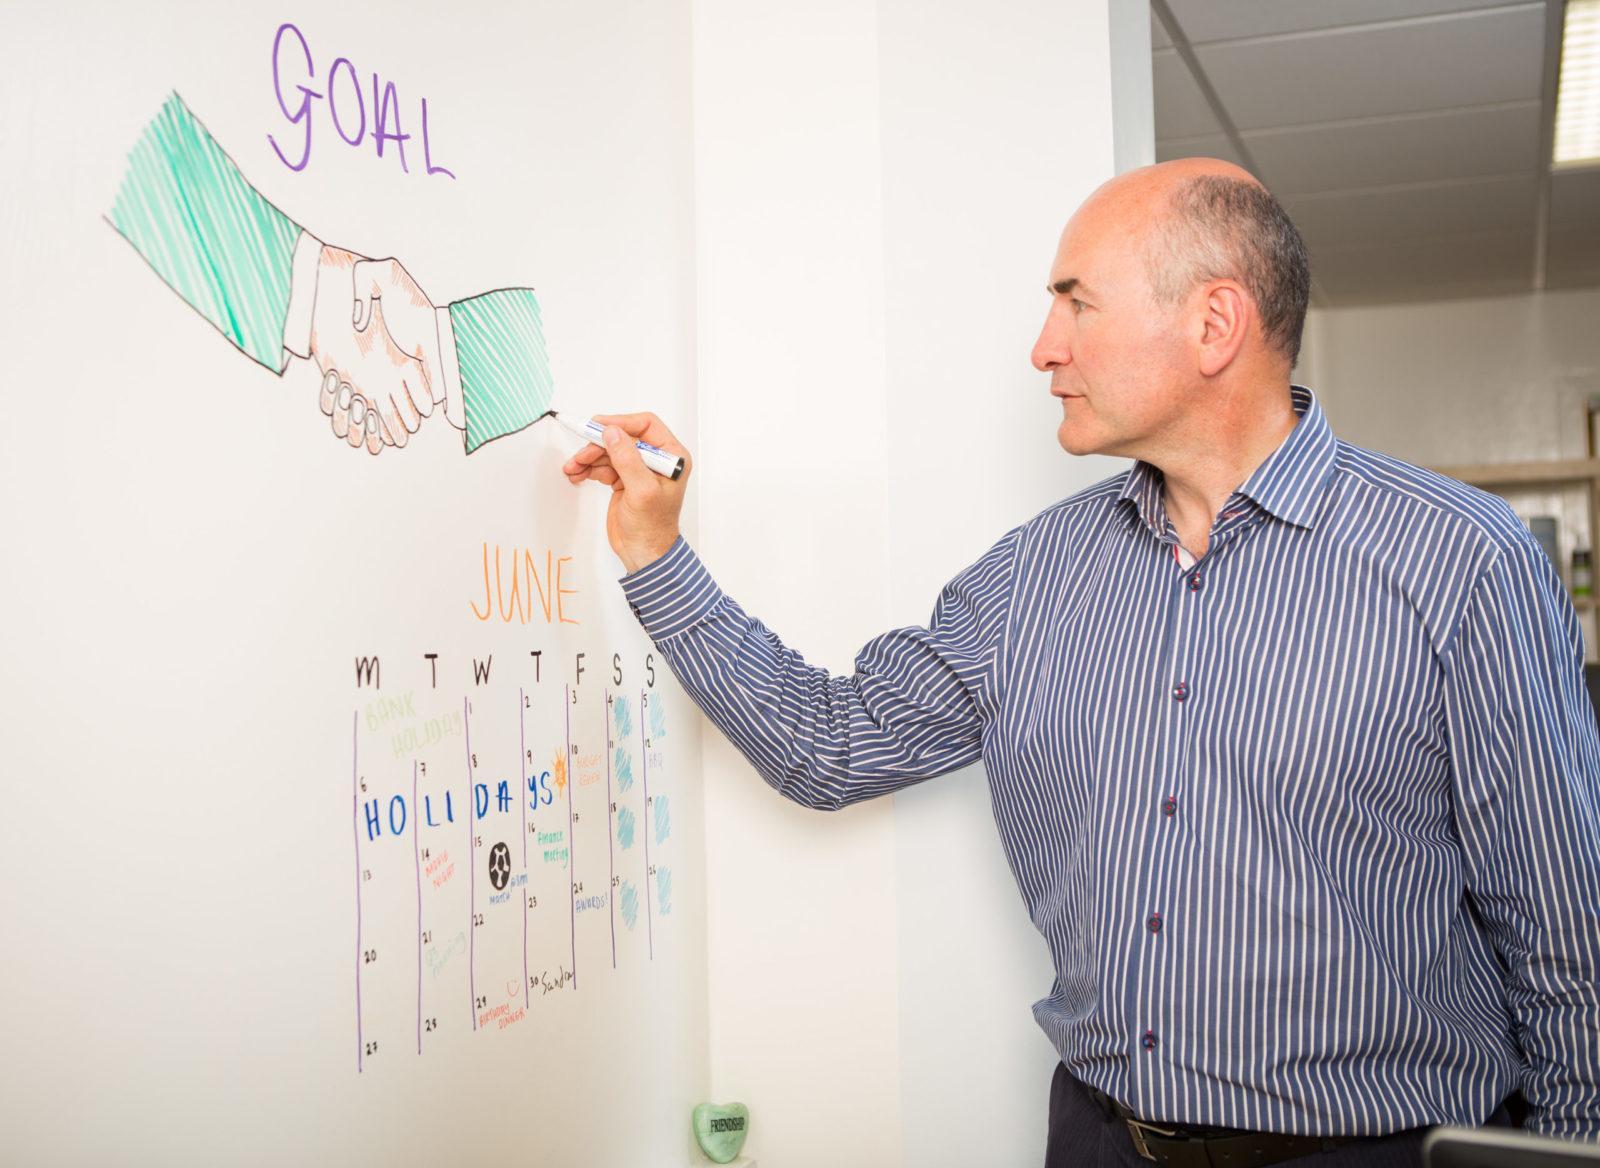 man using smart whiteboard paint wall in office